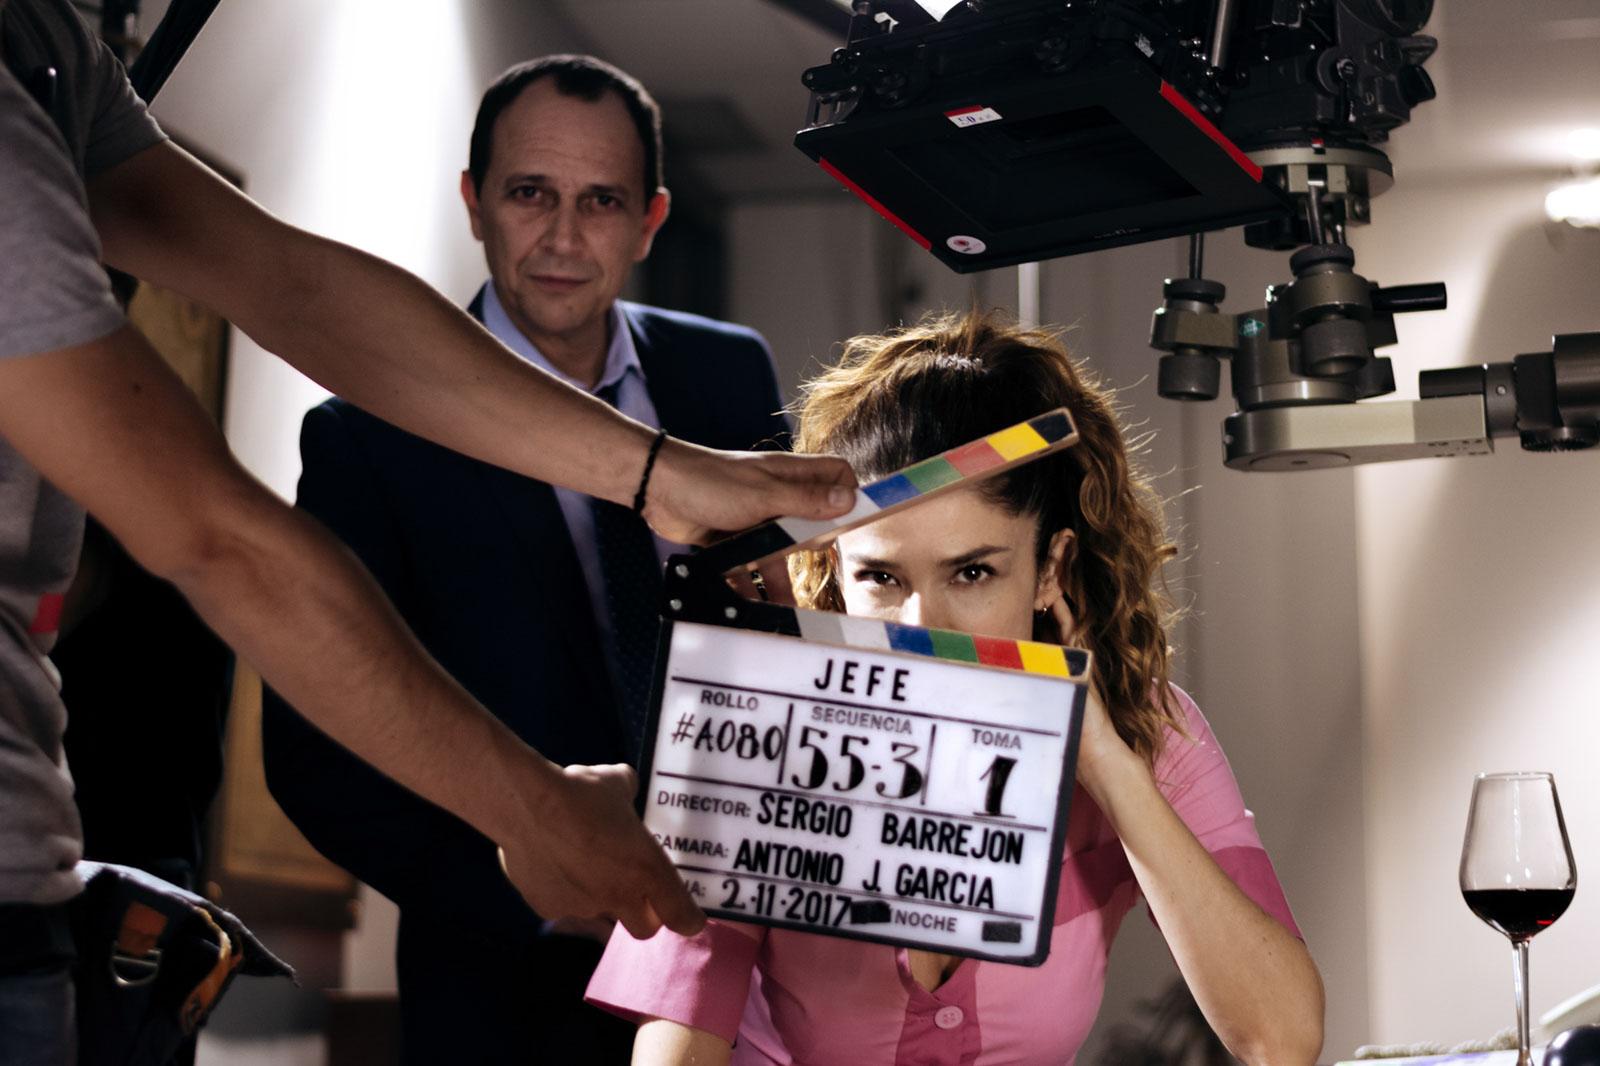 Jefe: Film – Behind the scenes